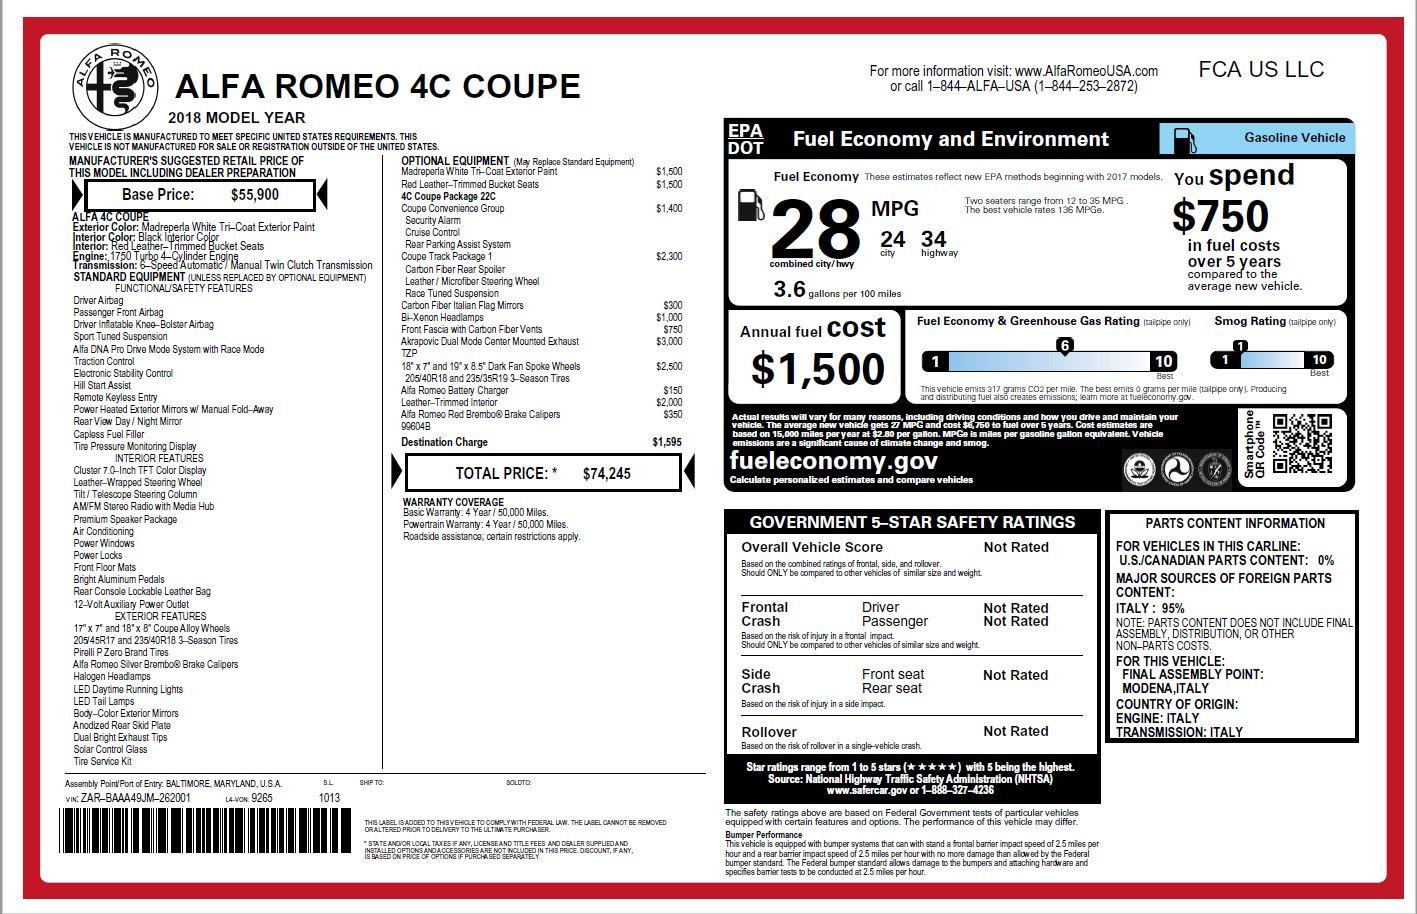 New-2018-Alfa-Romeo-4C-Coupe